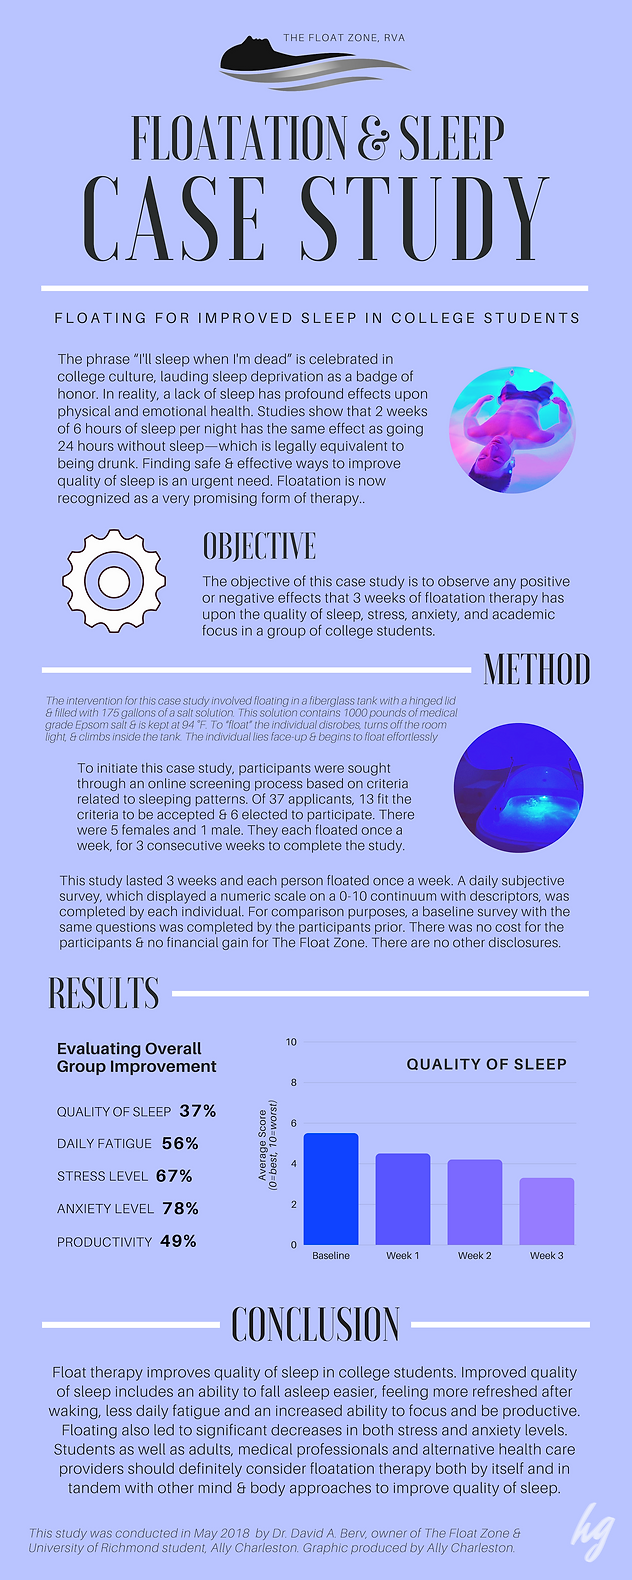 The Float Zone: UR Sleep Study